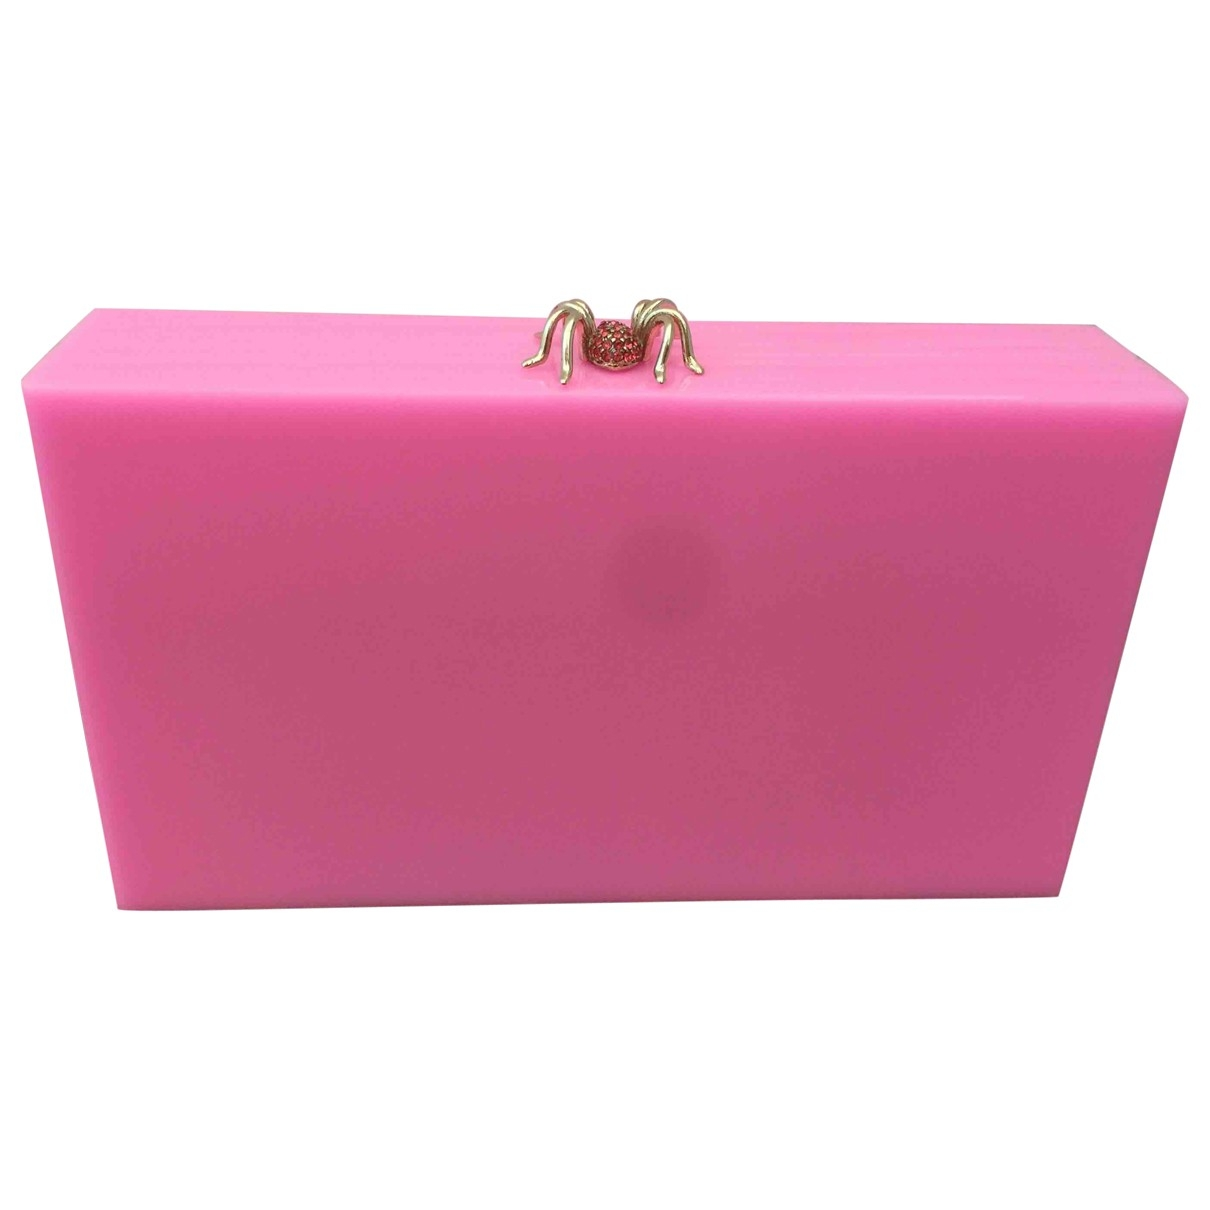 Charlotte Olympia \N Pink Clutch bag for Women \N